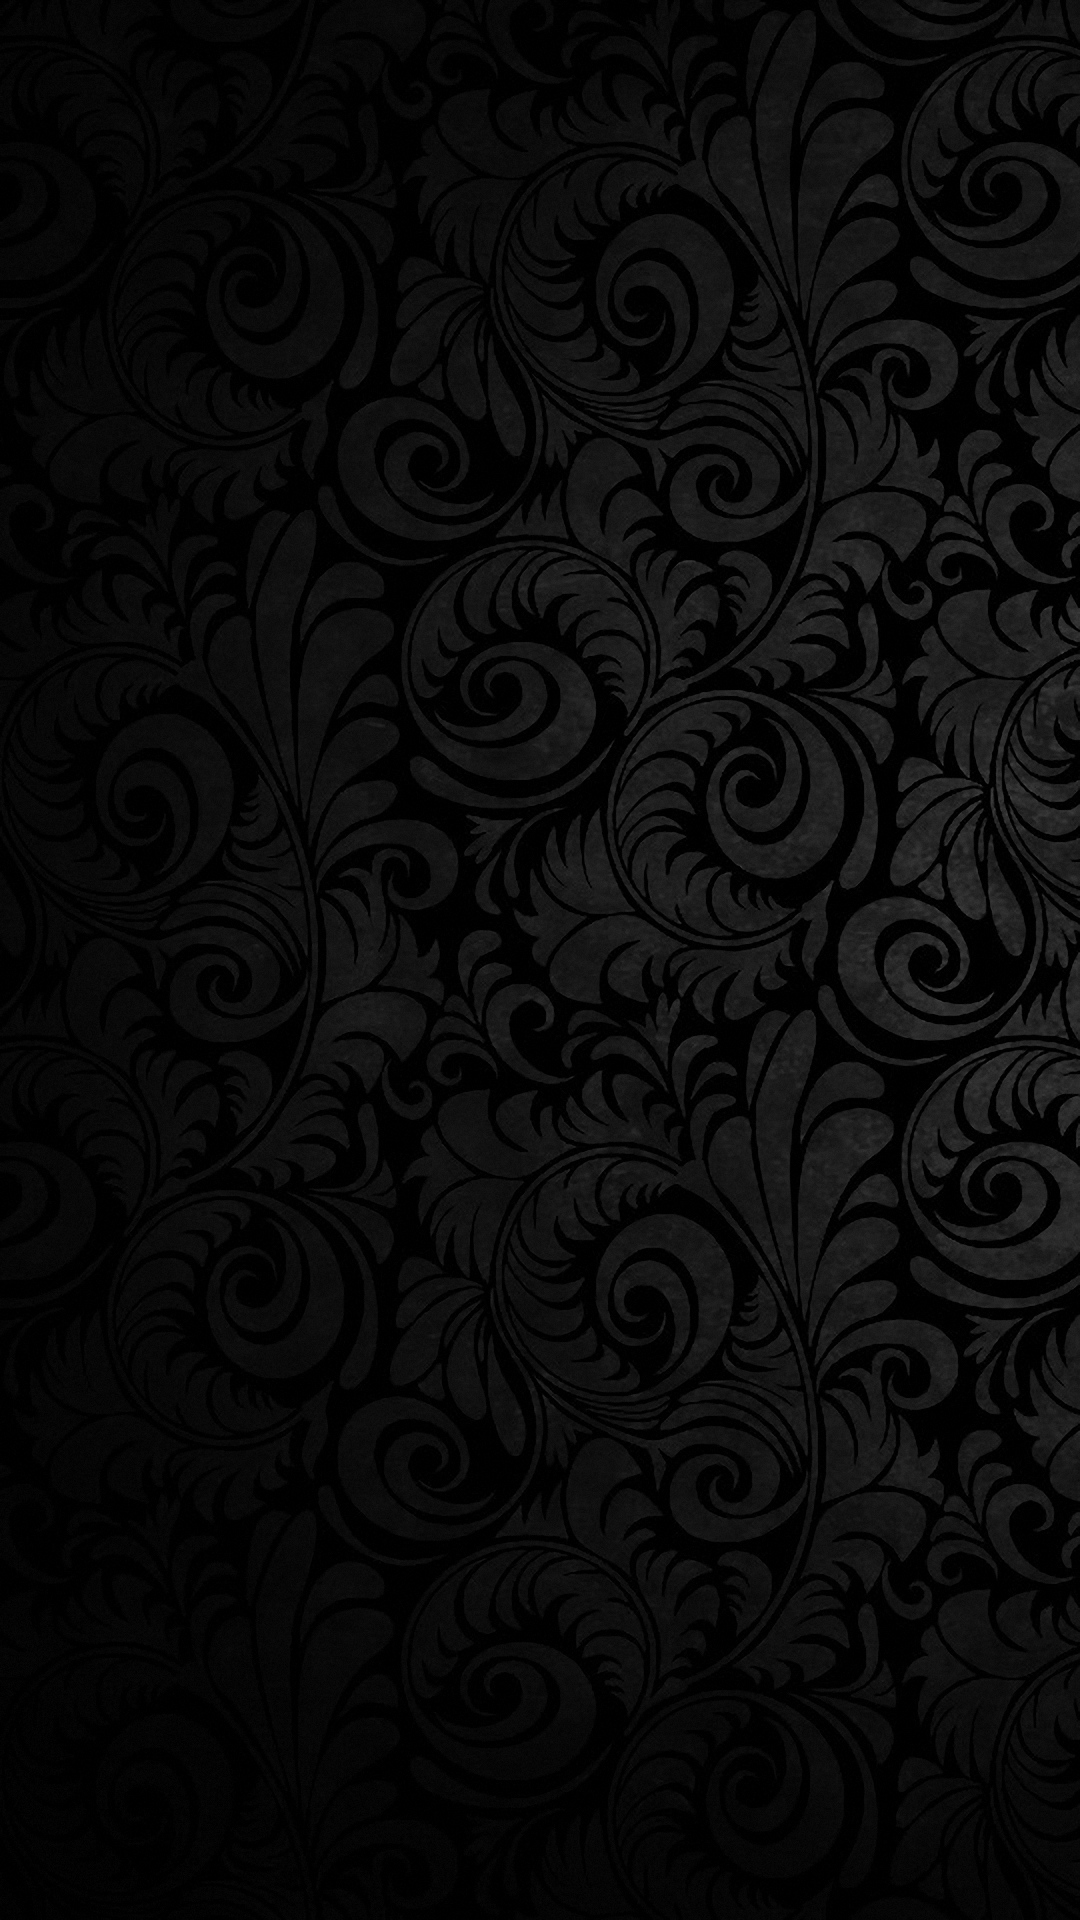 Full HD 1080x1920 Wallpapers